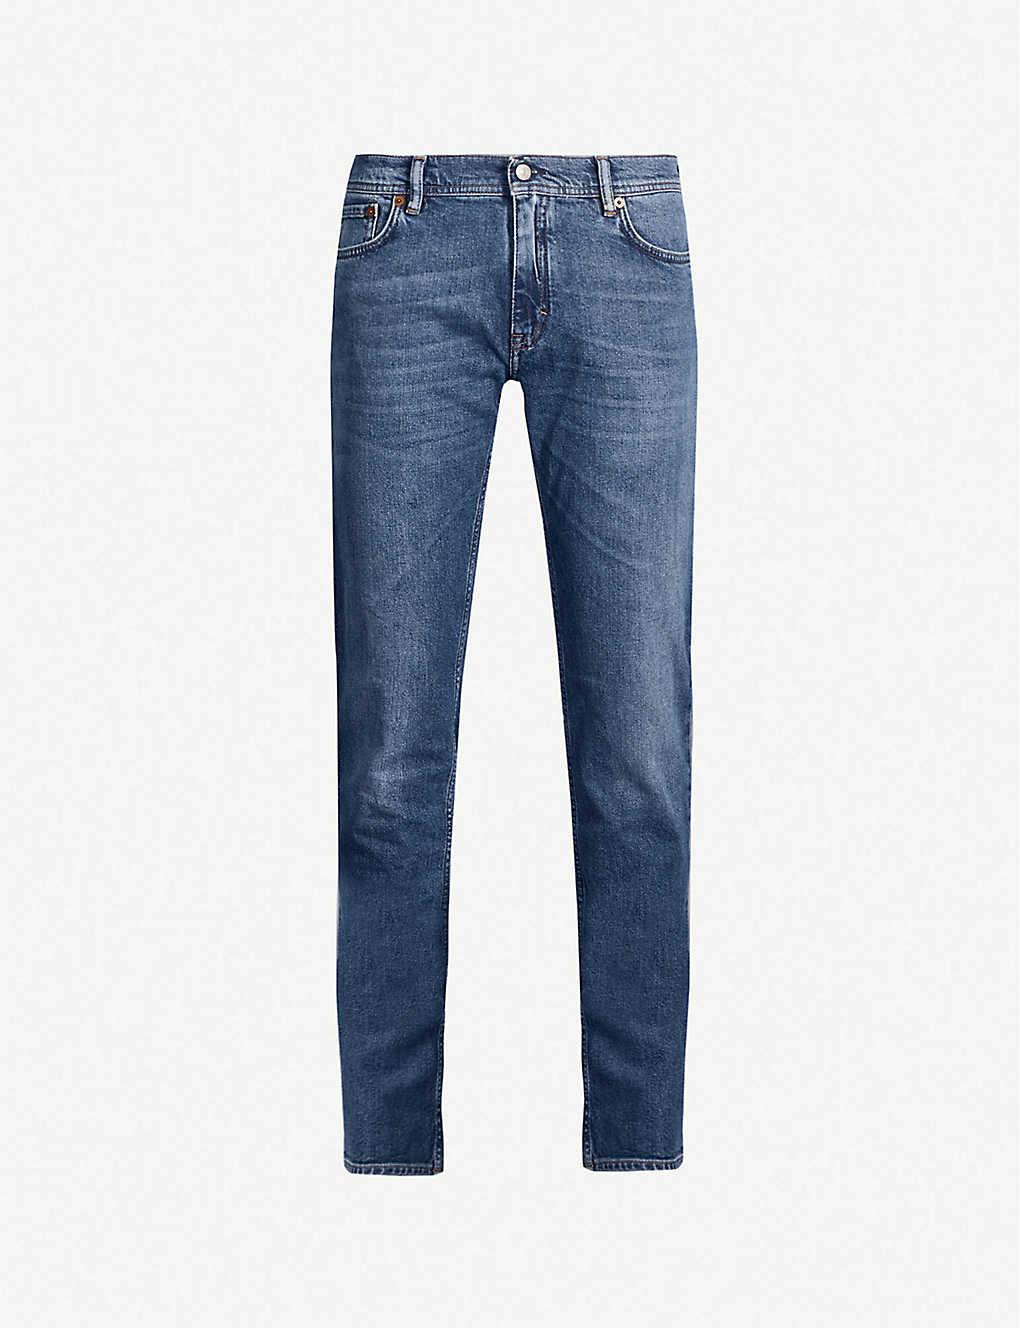 455b6d8e ACNE STUDIOS - North slim-fit skinny jeans | Selfridges.com